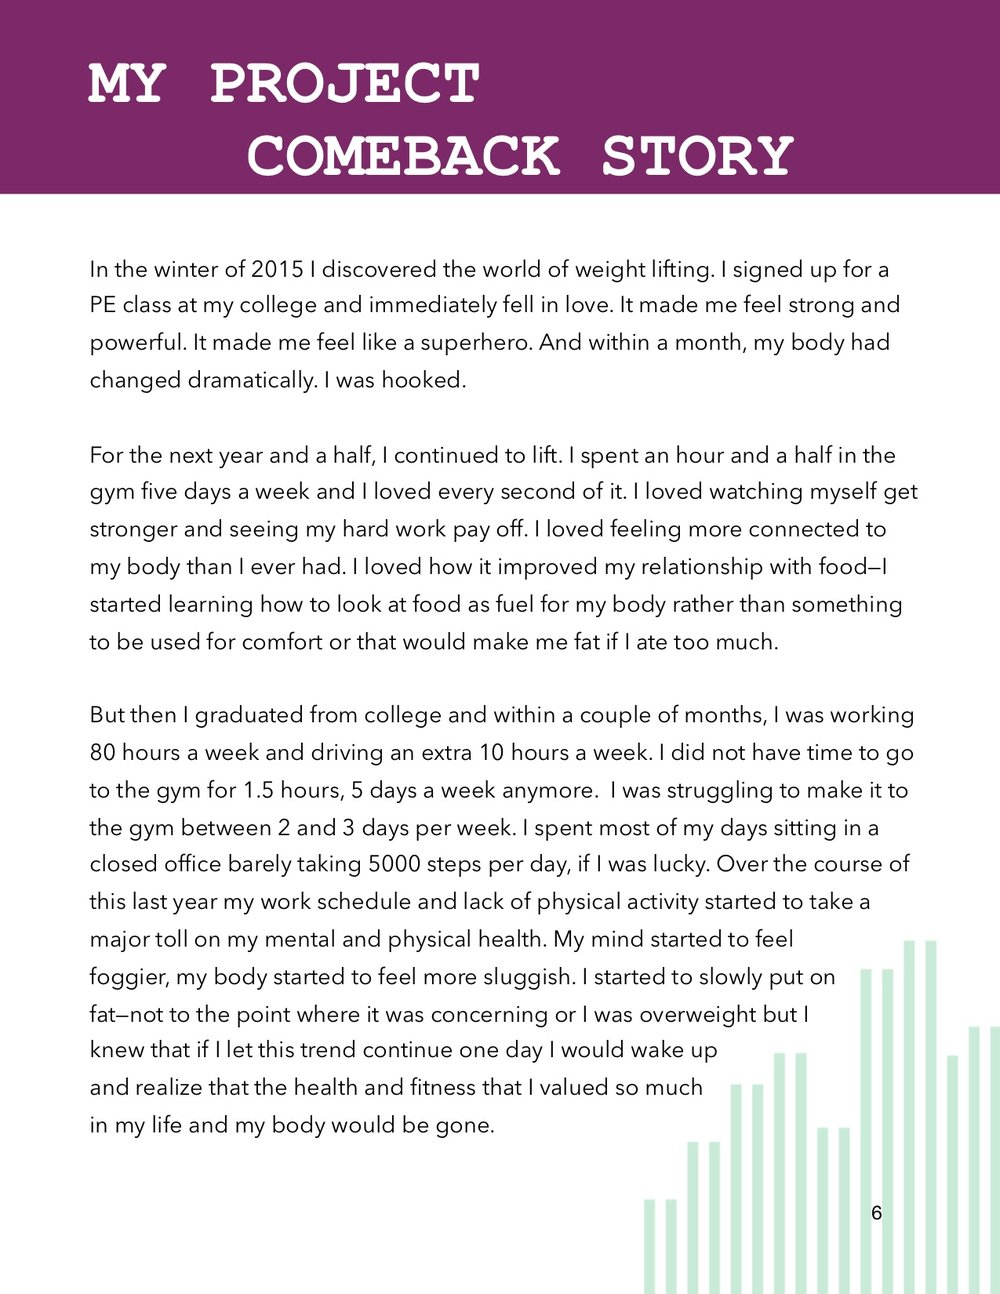 Project Comeback story.jpg